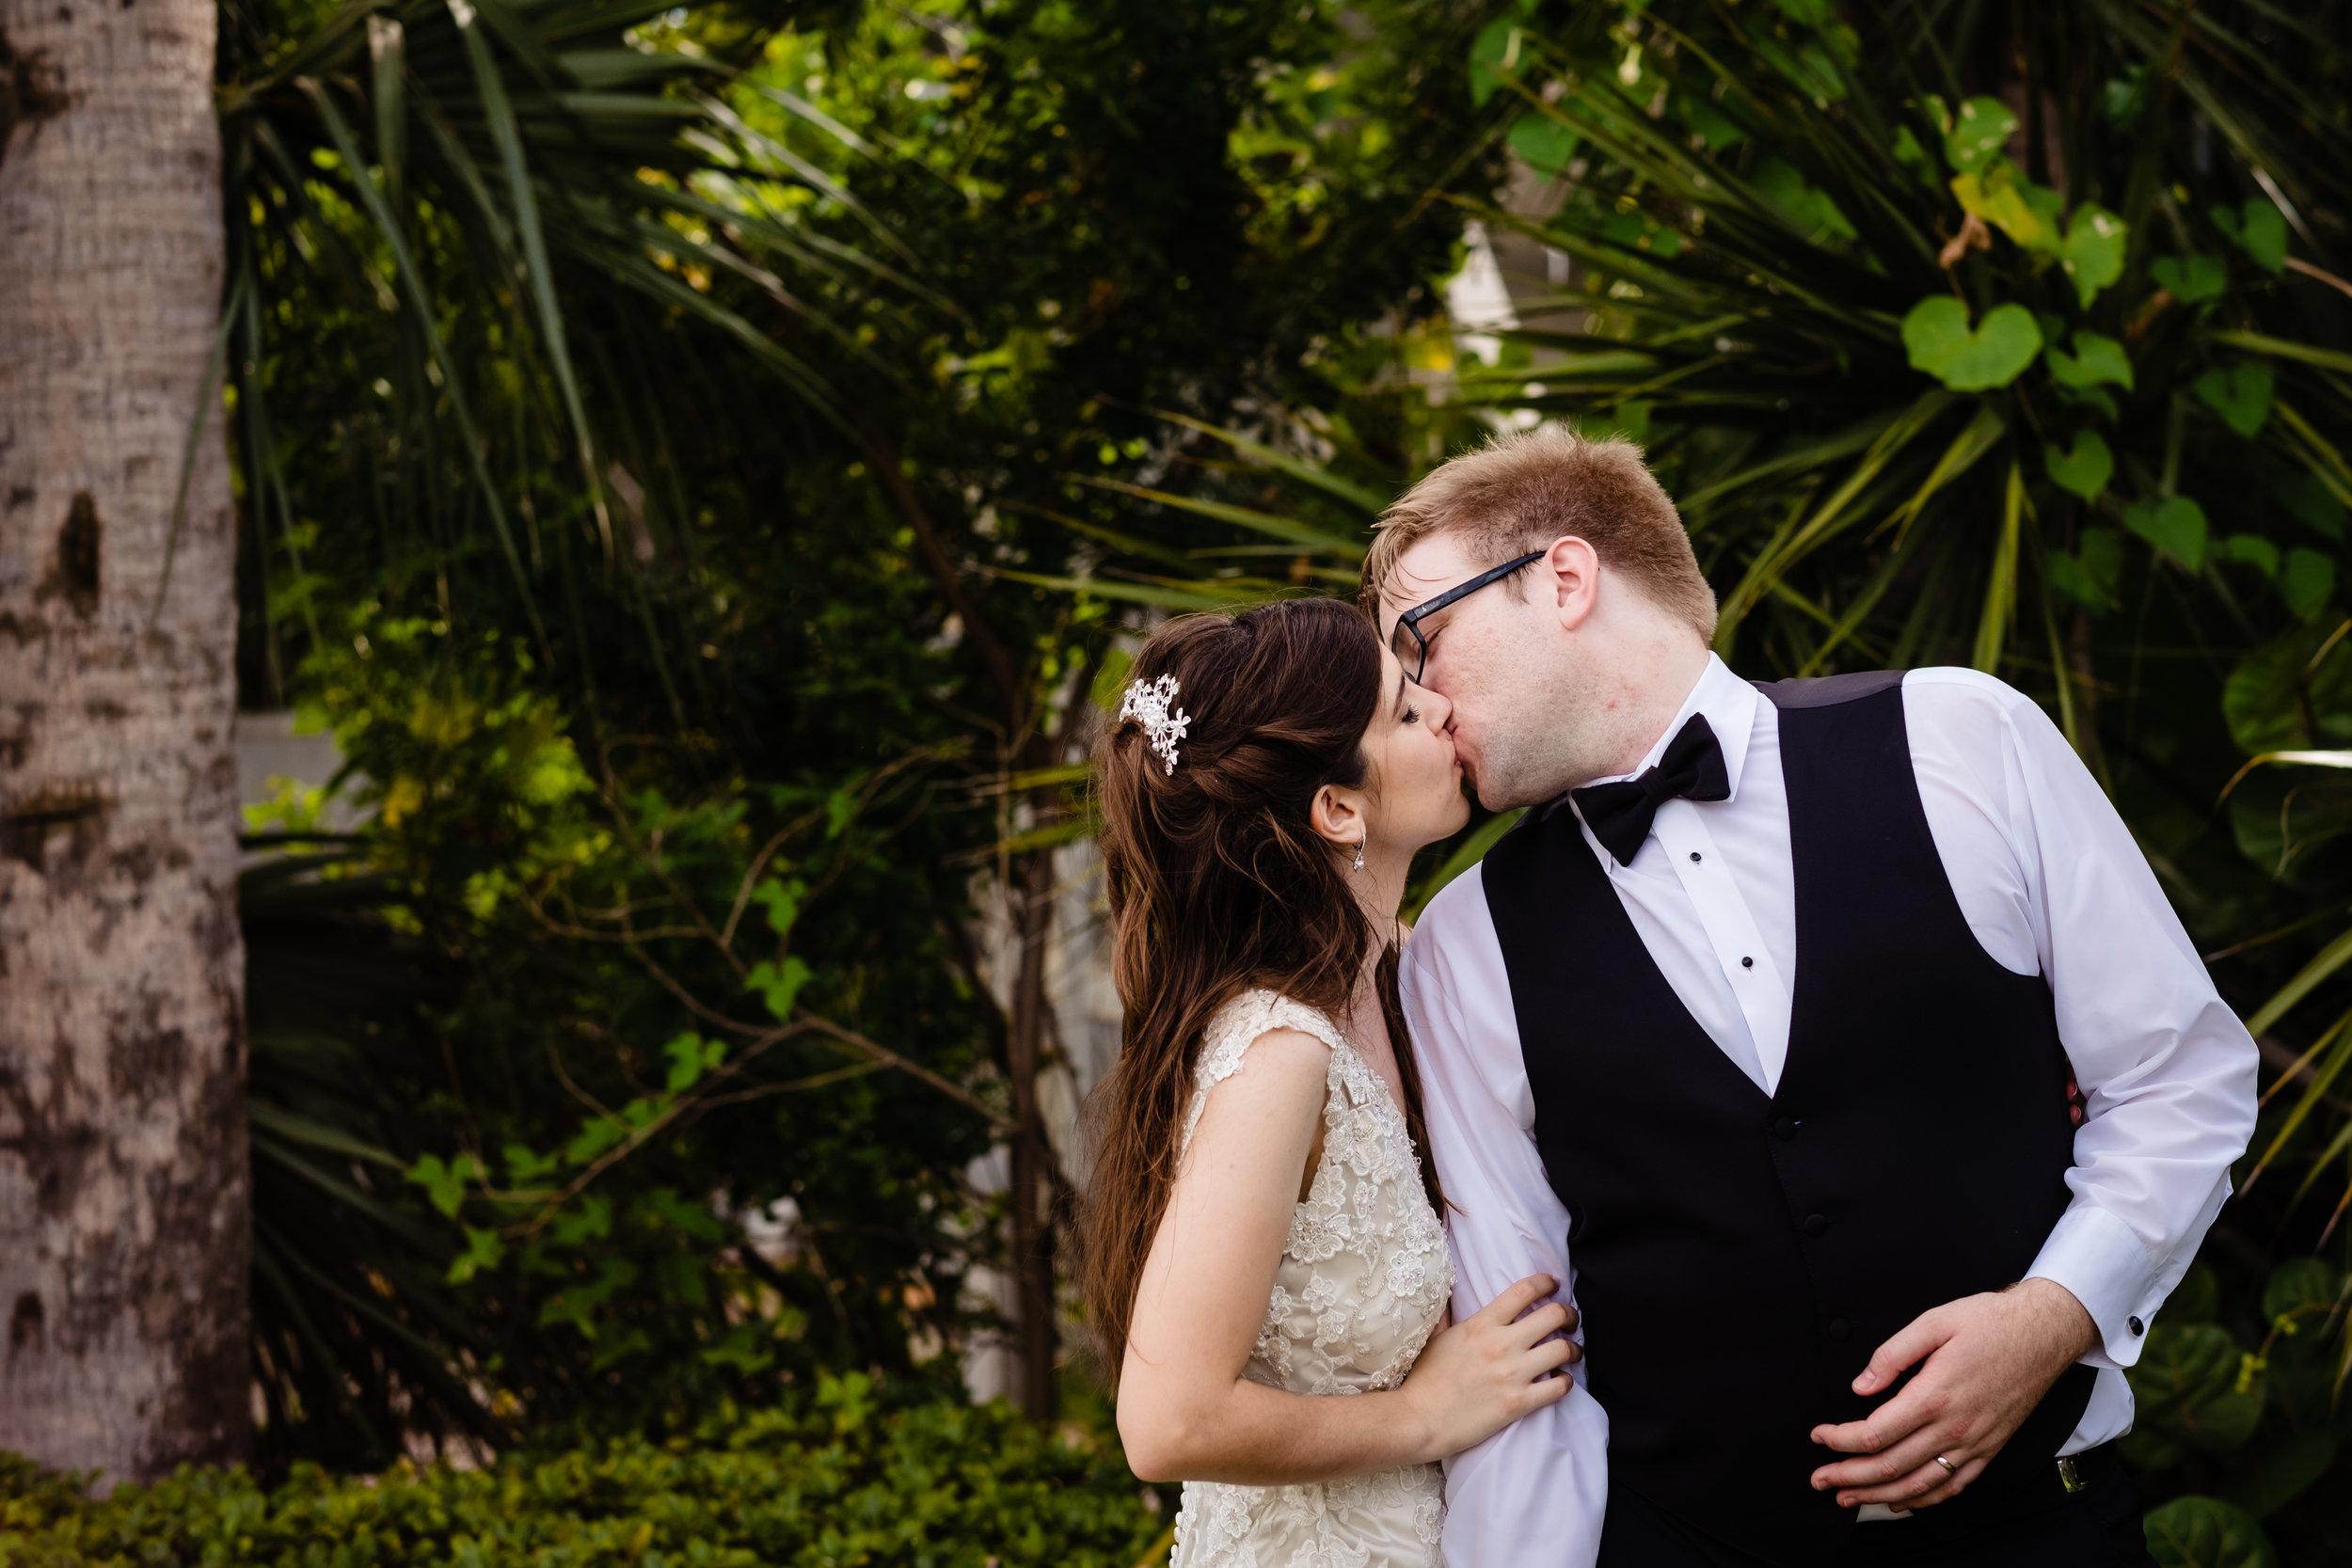 HAH_Zoe and Daniel_Clearwater Wedding_617_2018.jpg